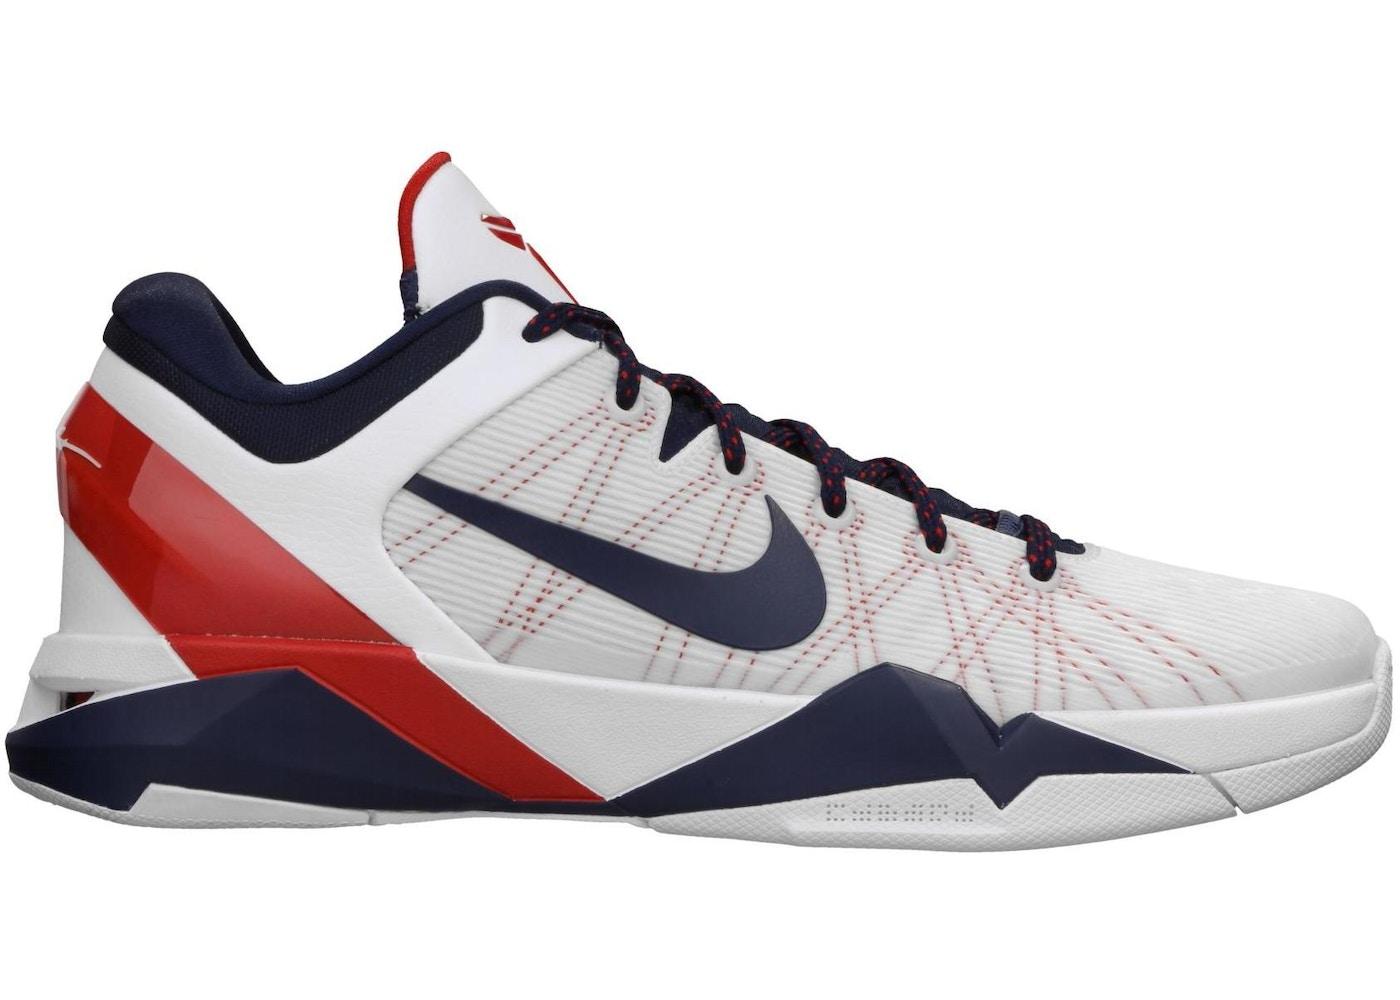 premium selection 9e2b5 b1a55 ... Kobe 7 USA Olympic Nike ...